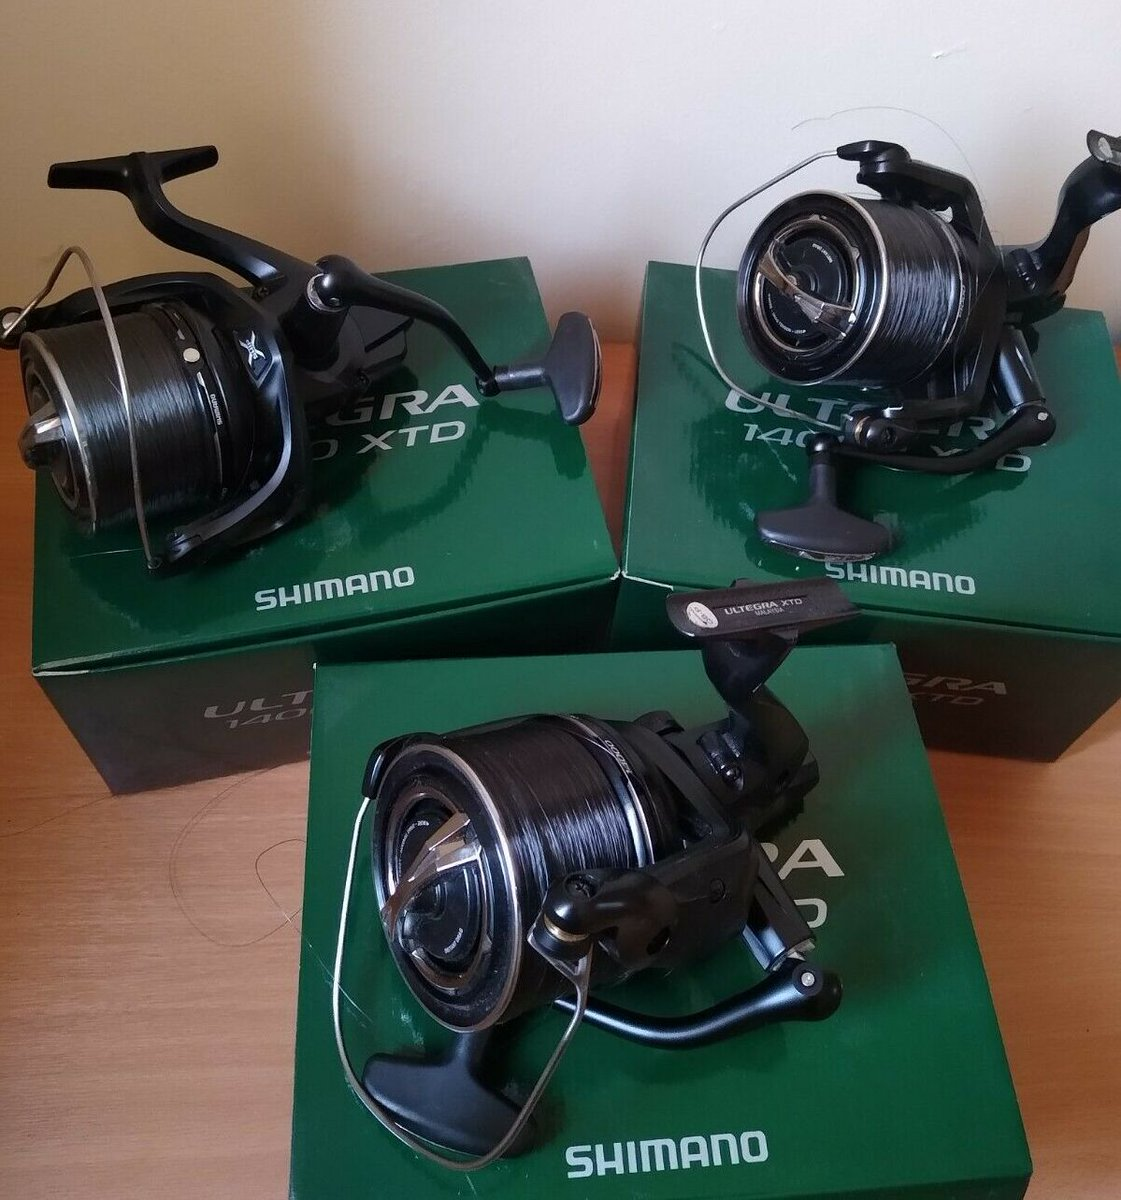 Ad - Shimano Ultegra 14000 XT-D x3 On eBay here -->> https://t.co/XLx6NssYeg  #carpfishing #fi